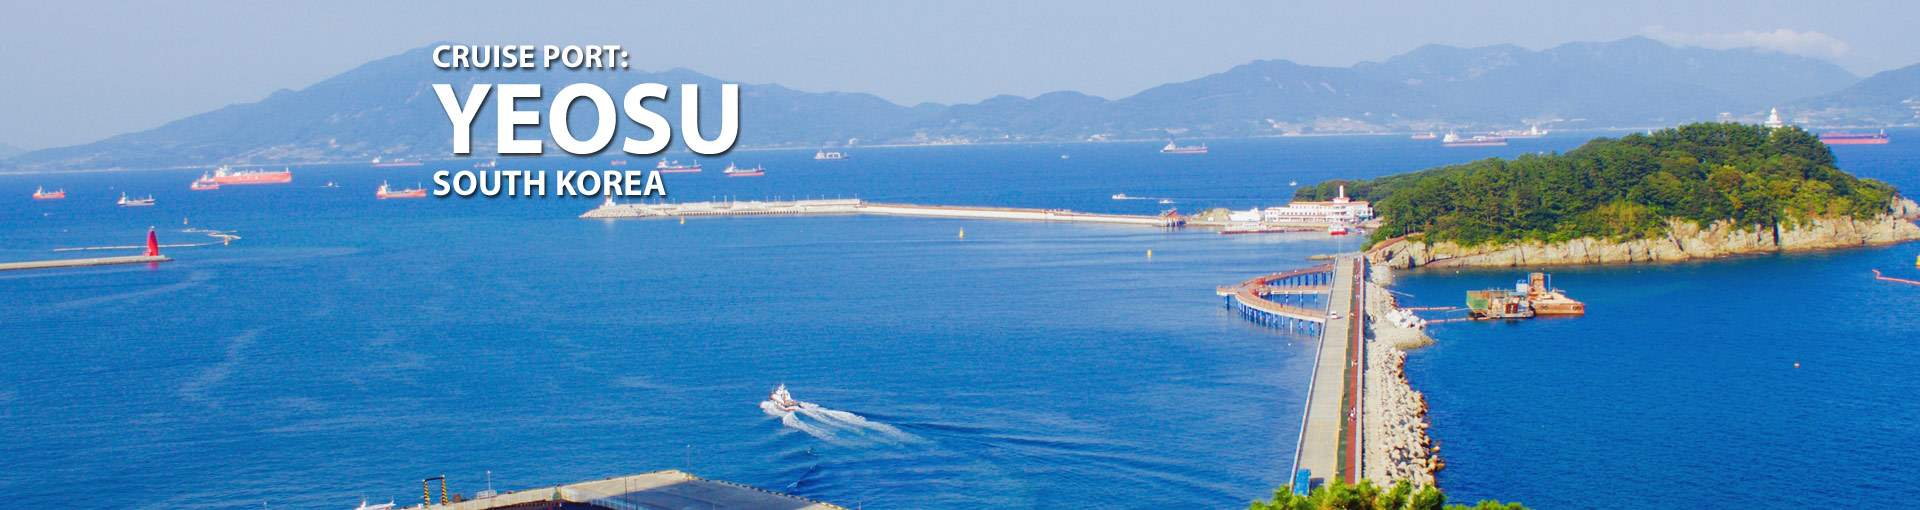 Yeosu, South Korea Cruise Port